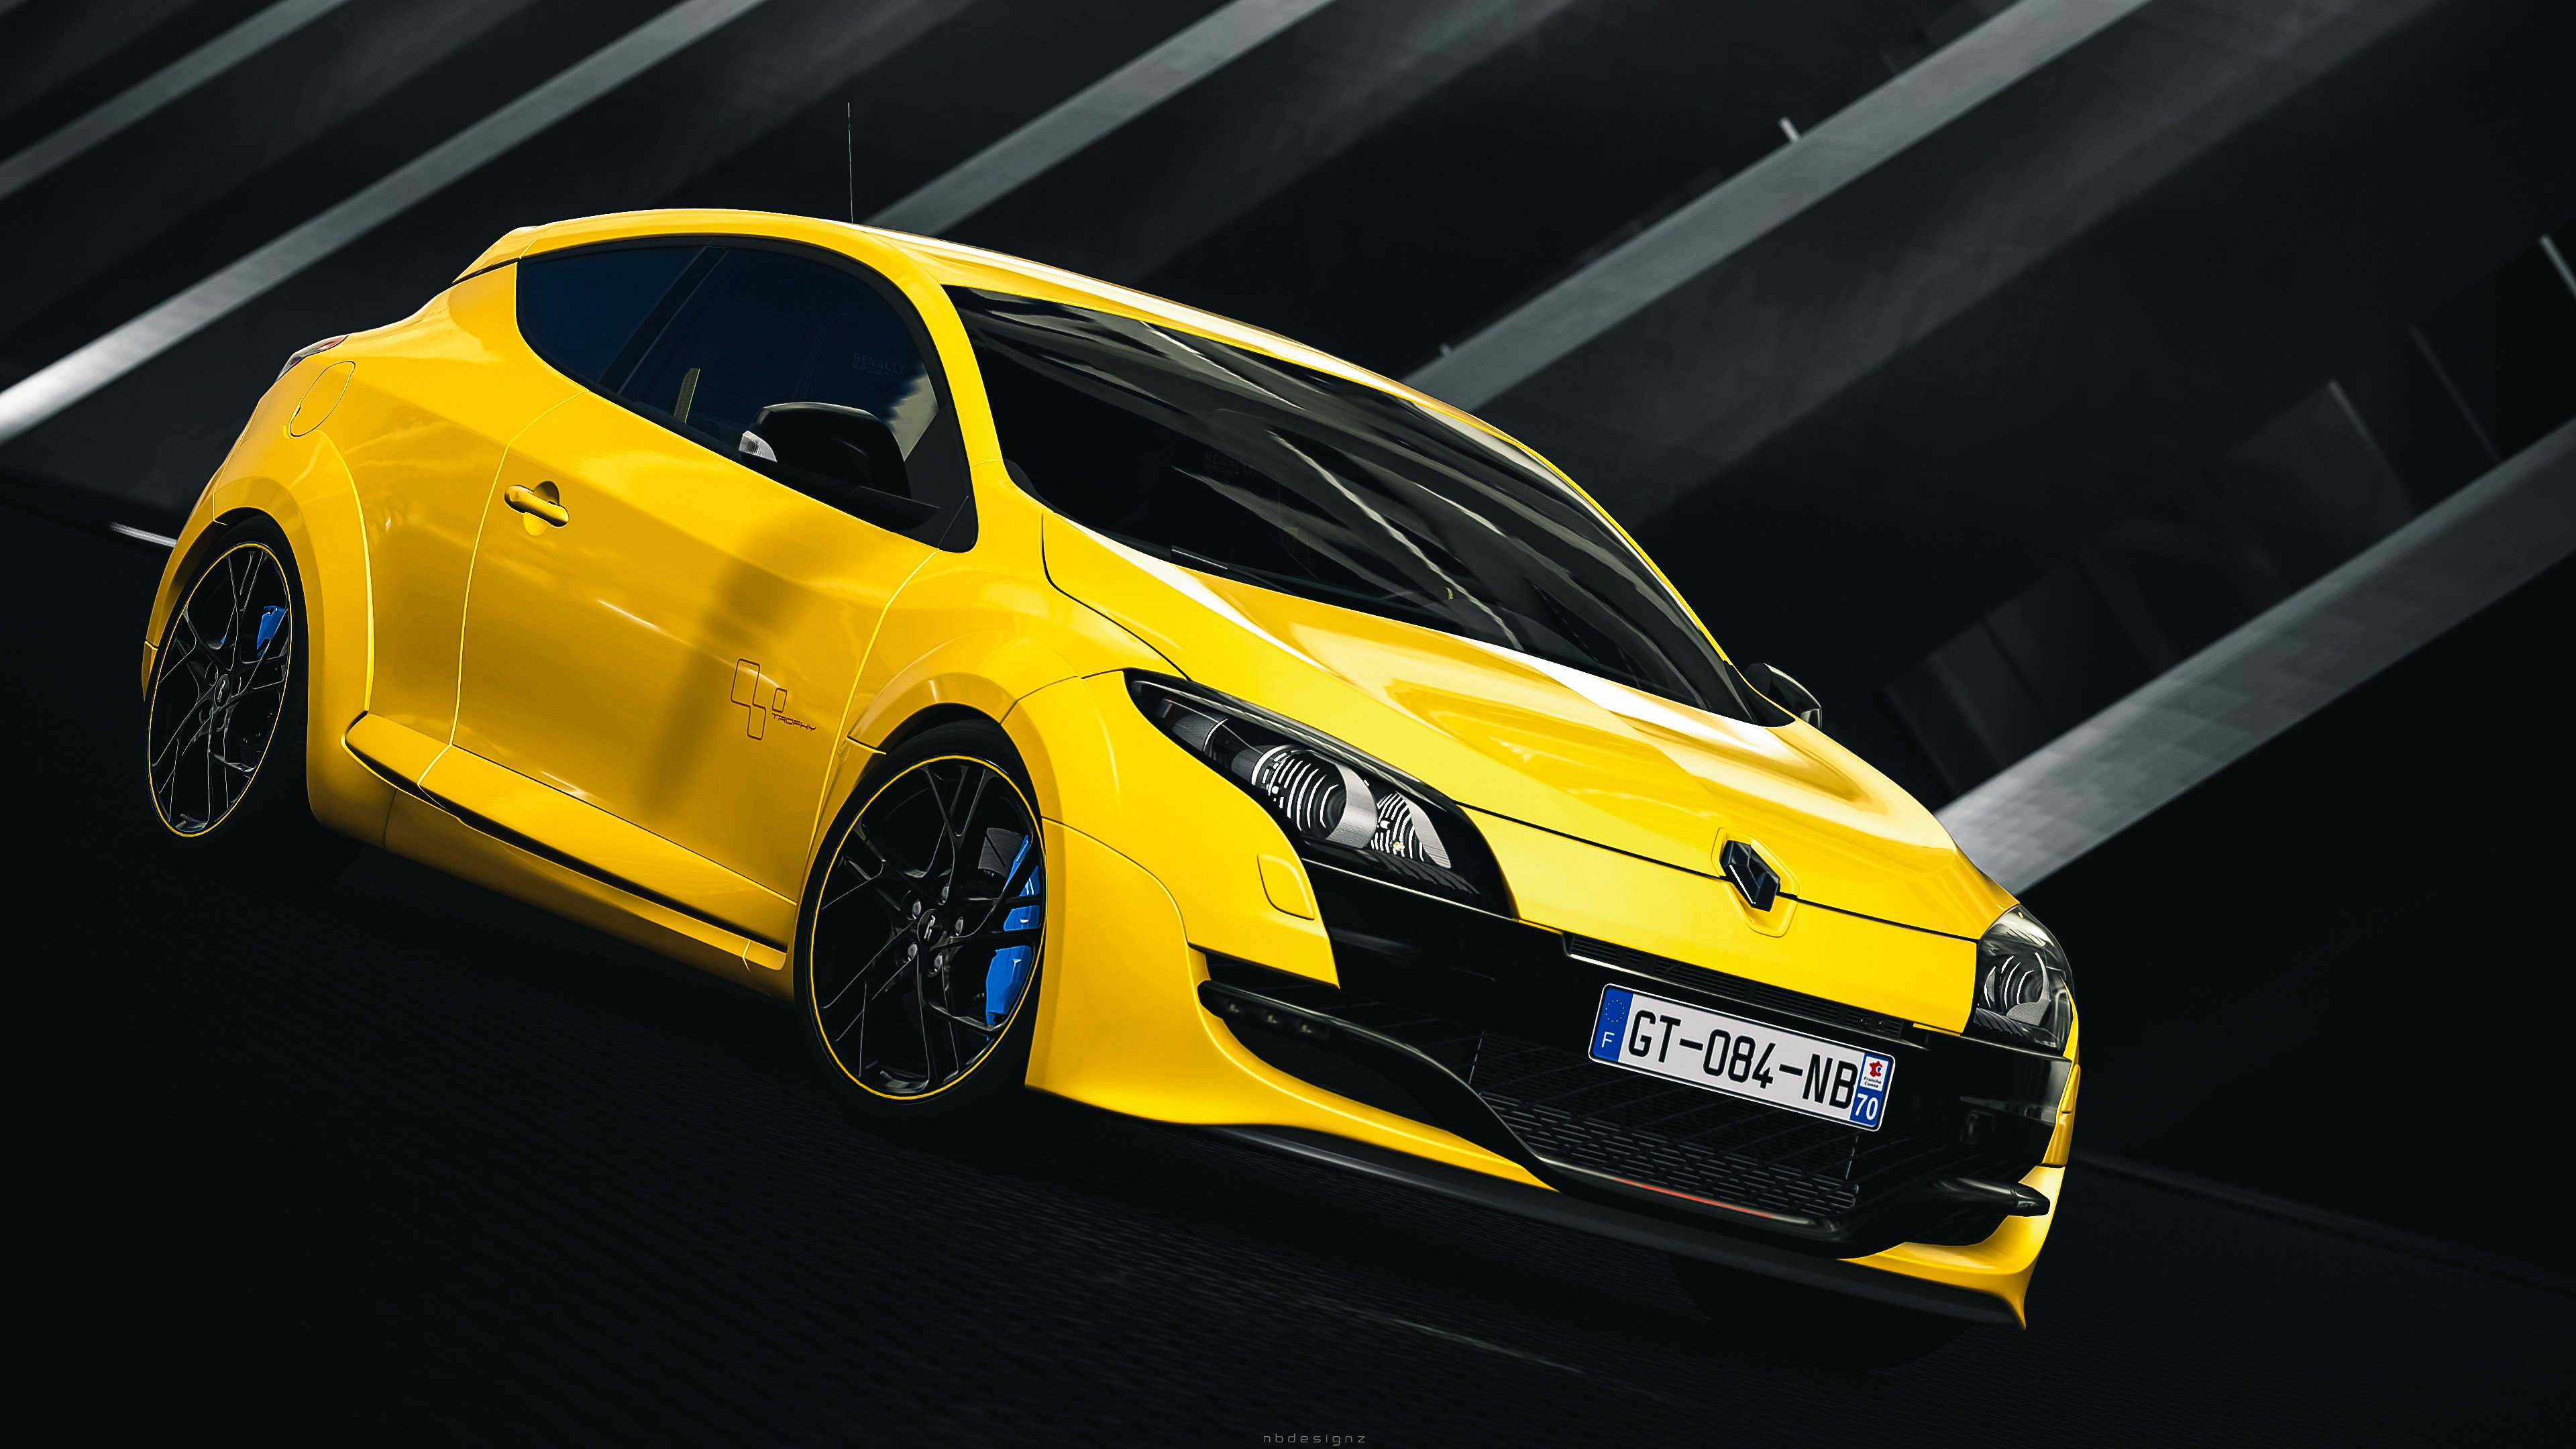 Renault Megane Sport 4k Ultra HD Wallpaper